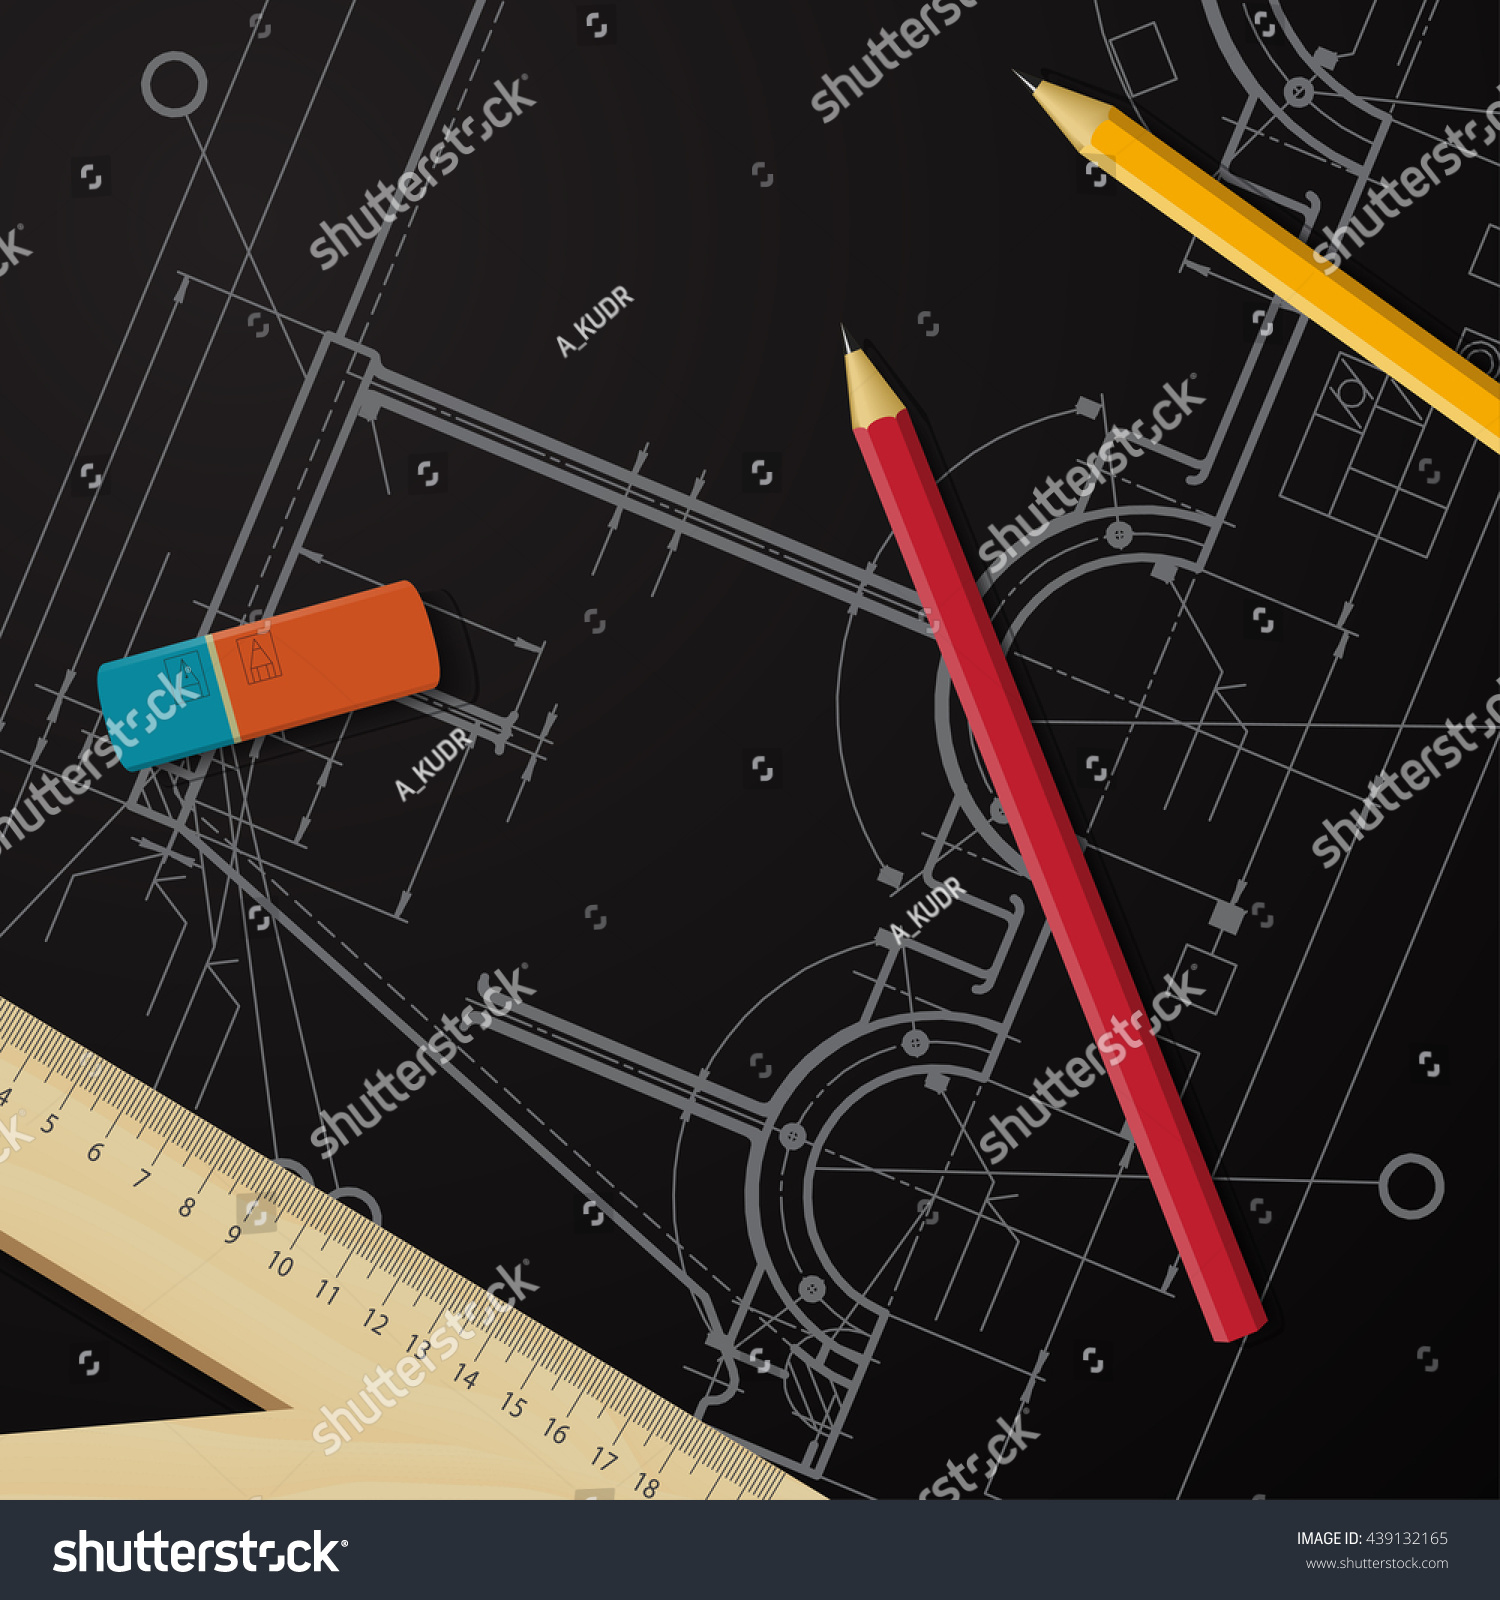 Vector technical blueprint mechanism engineer illustration stock vector technical blueprint of mechanism engineer illustration architecture background malvernweather Images